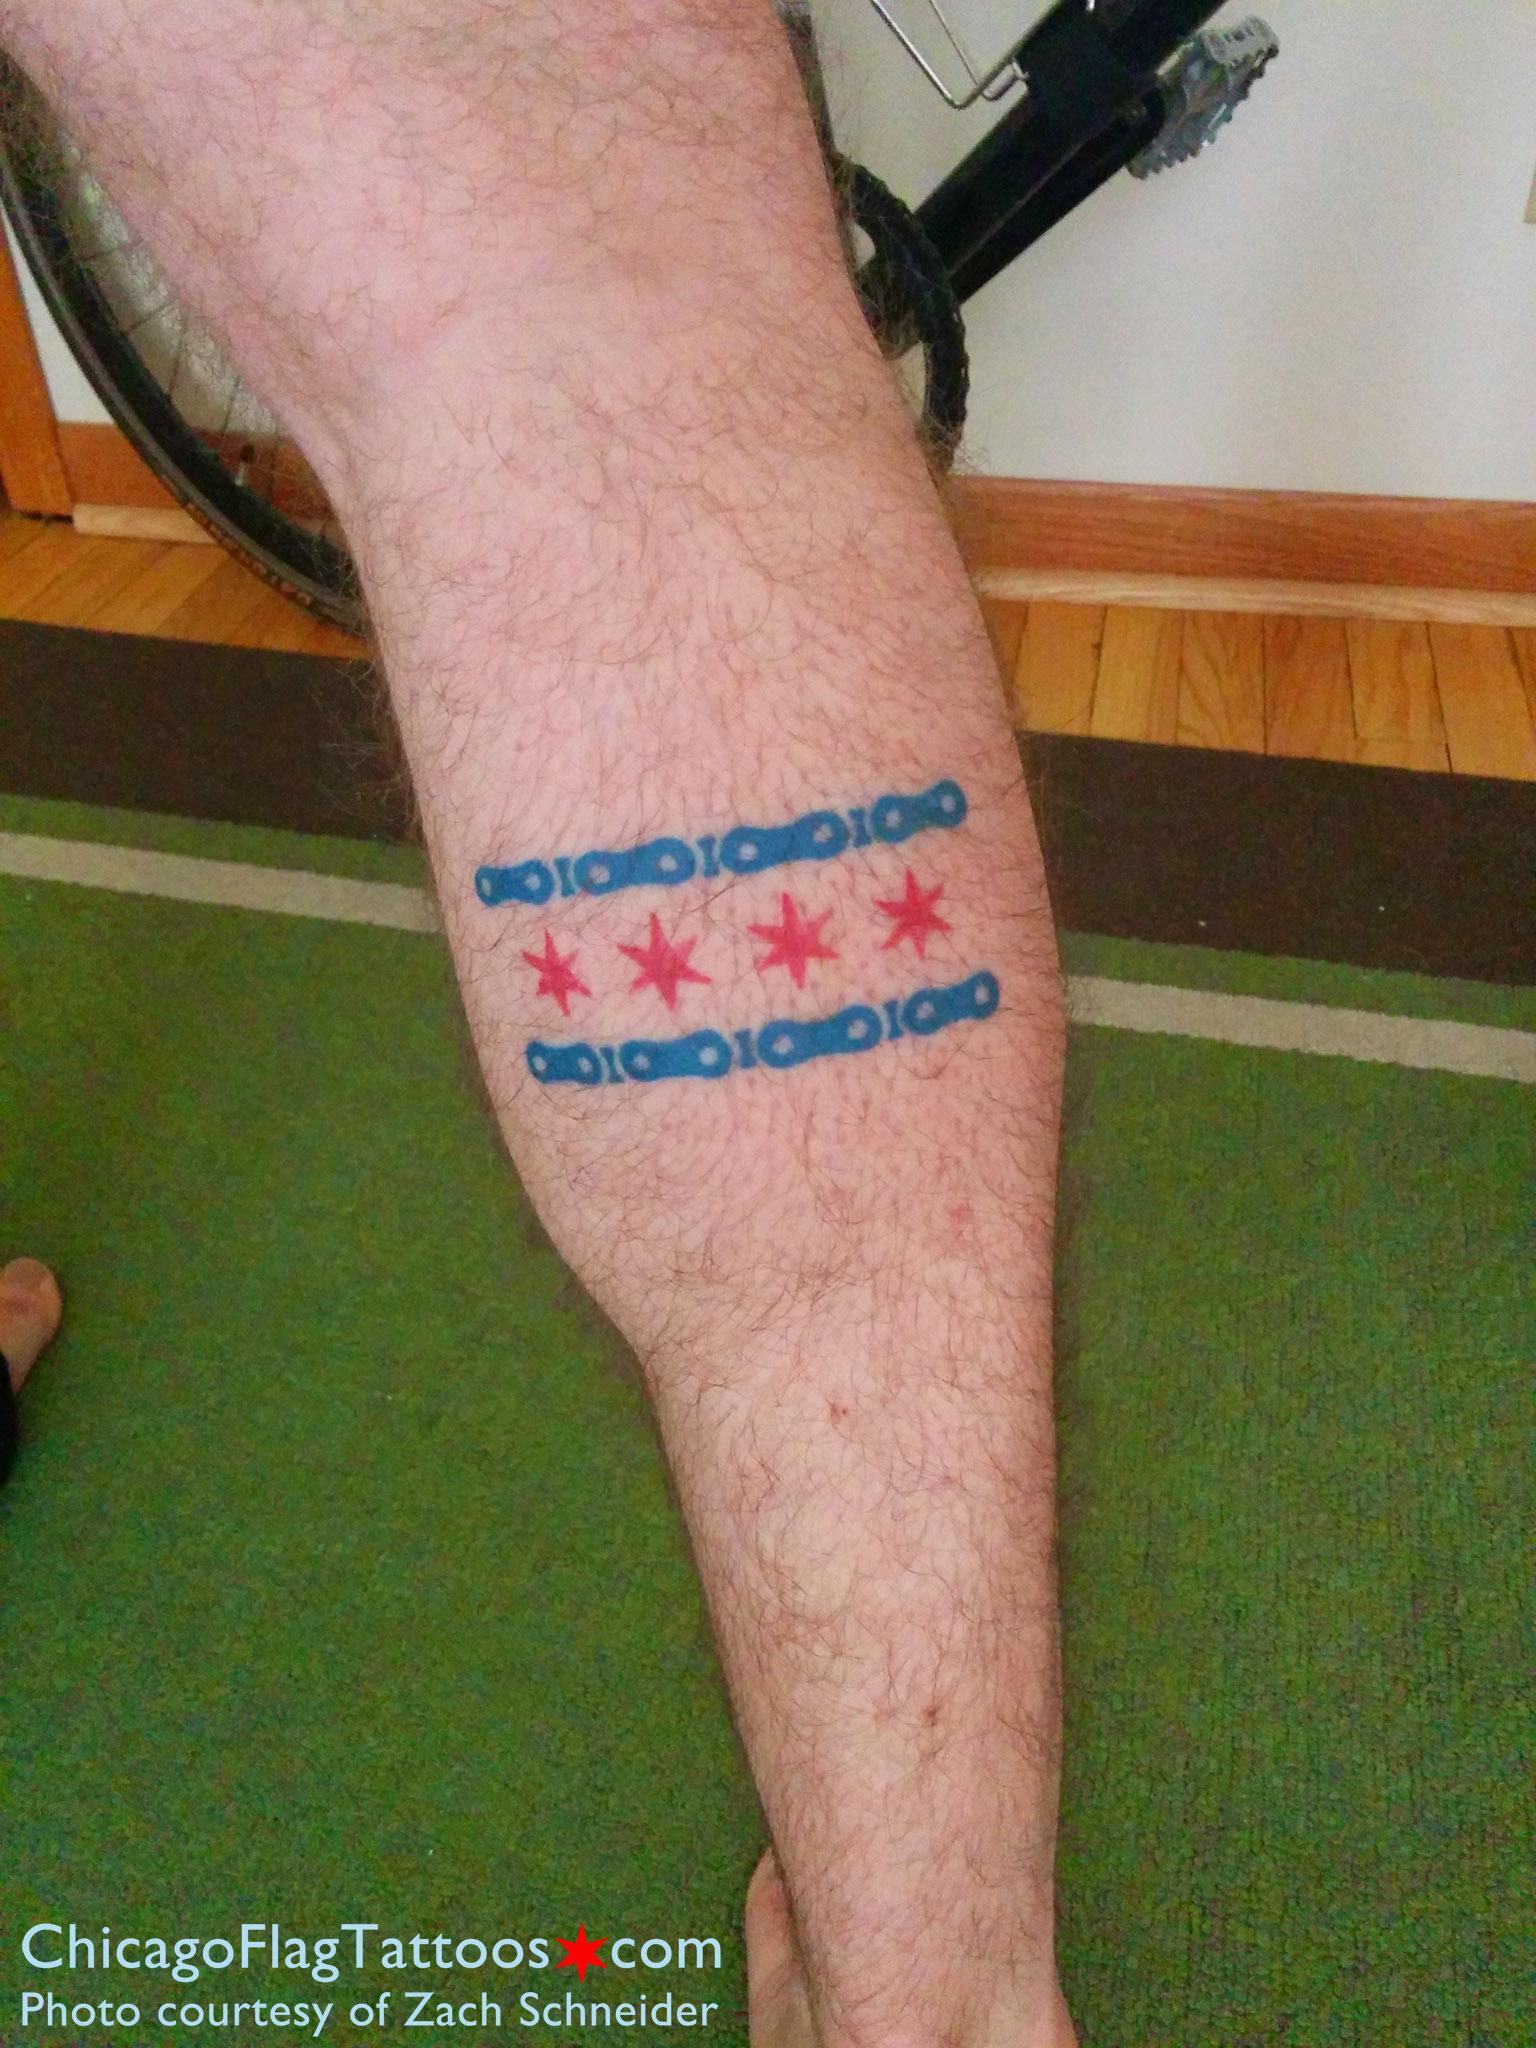 http://chicagoflagtattoos.com/img/Zach-Schneider-tattoo.jpg